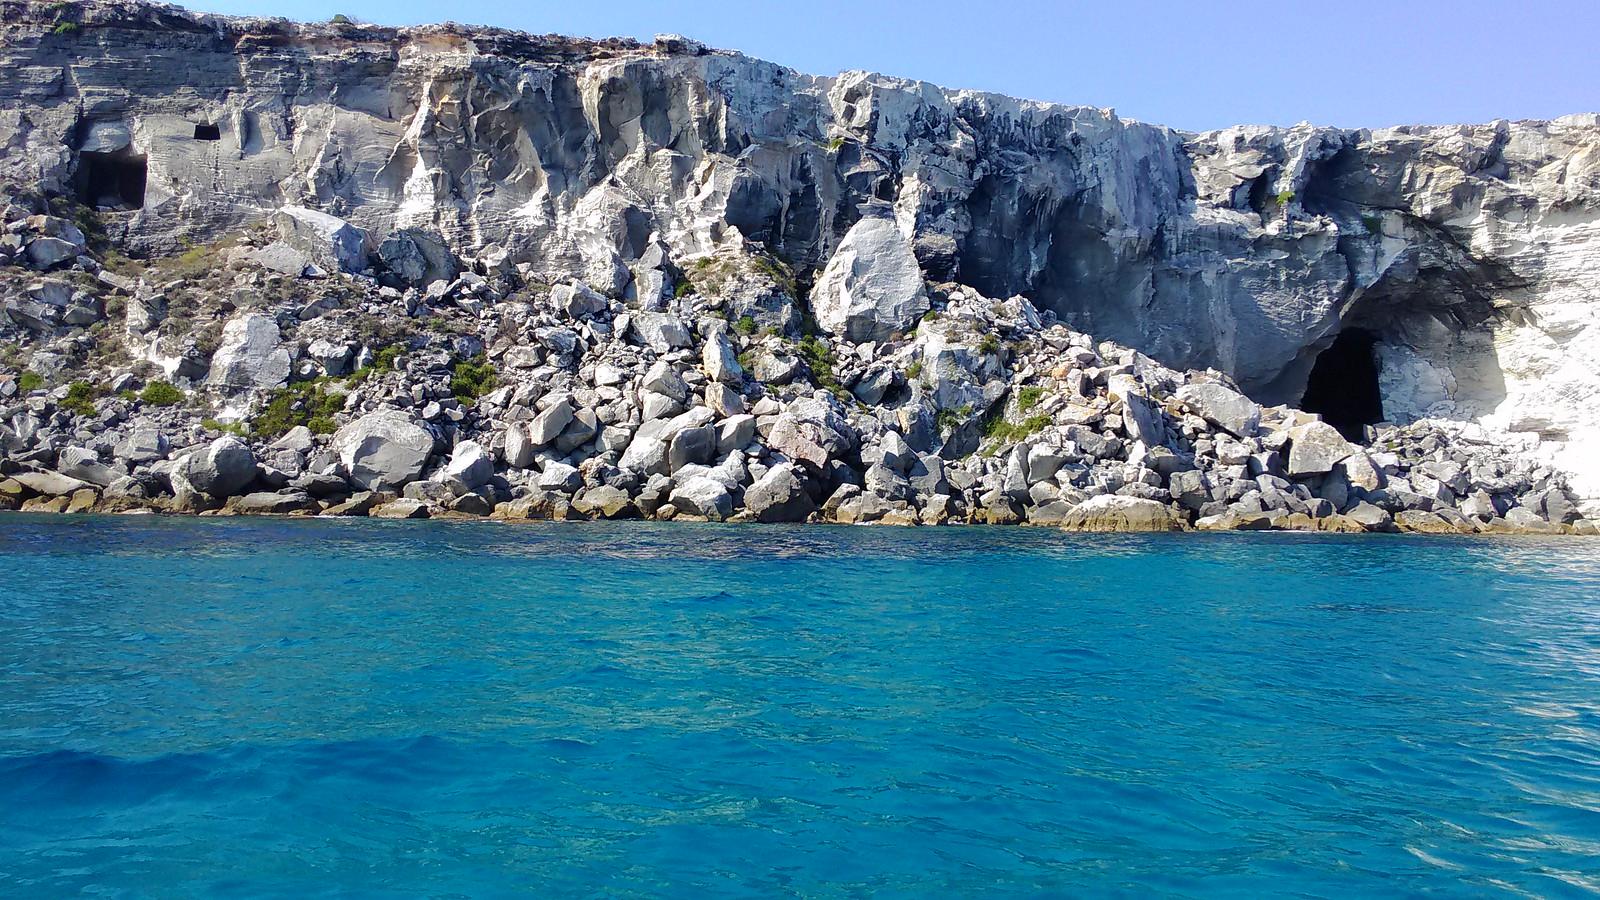 Cave Bianche di Tufo